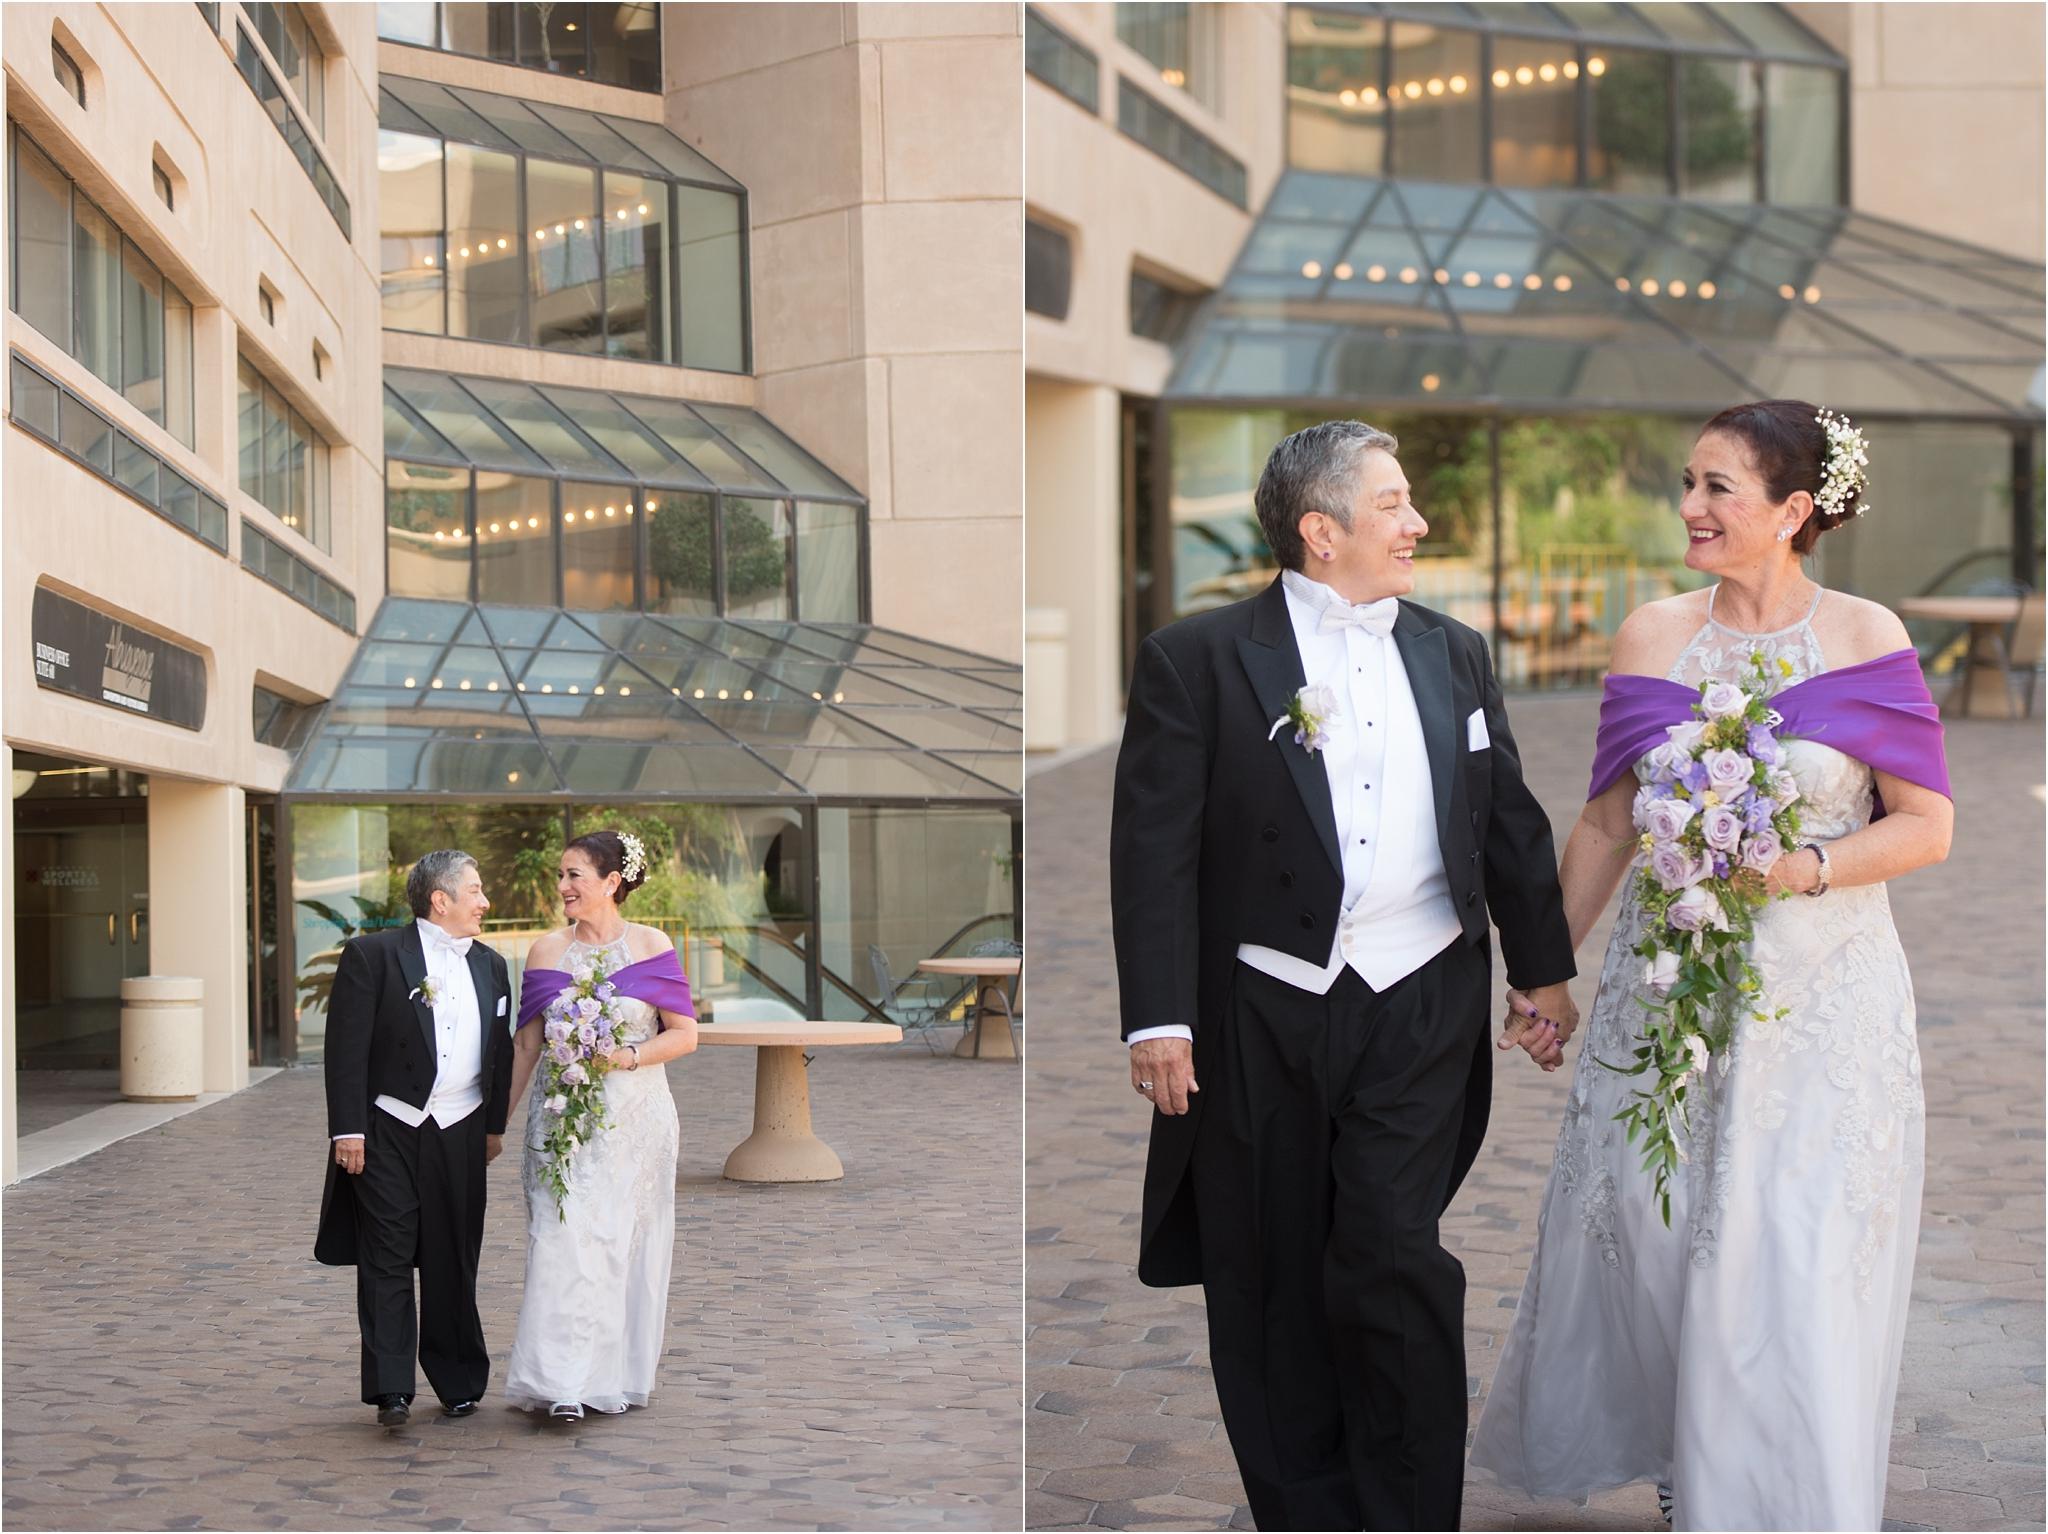 kayla kitts photography - albuquerque wedding photographer - hotel andaluz wedding_0015.jpg